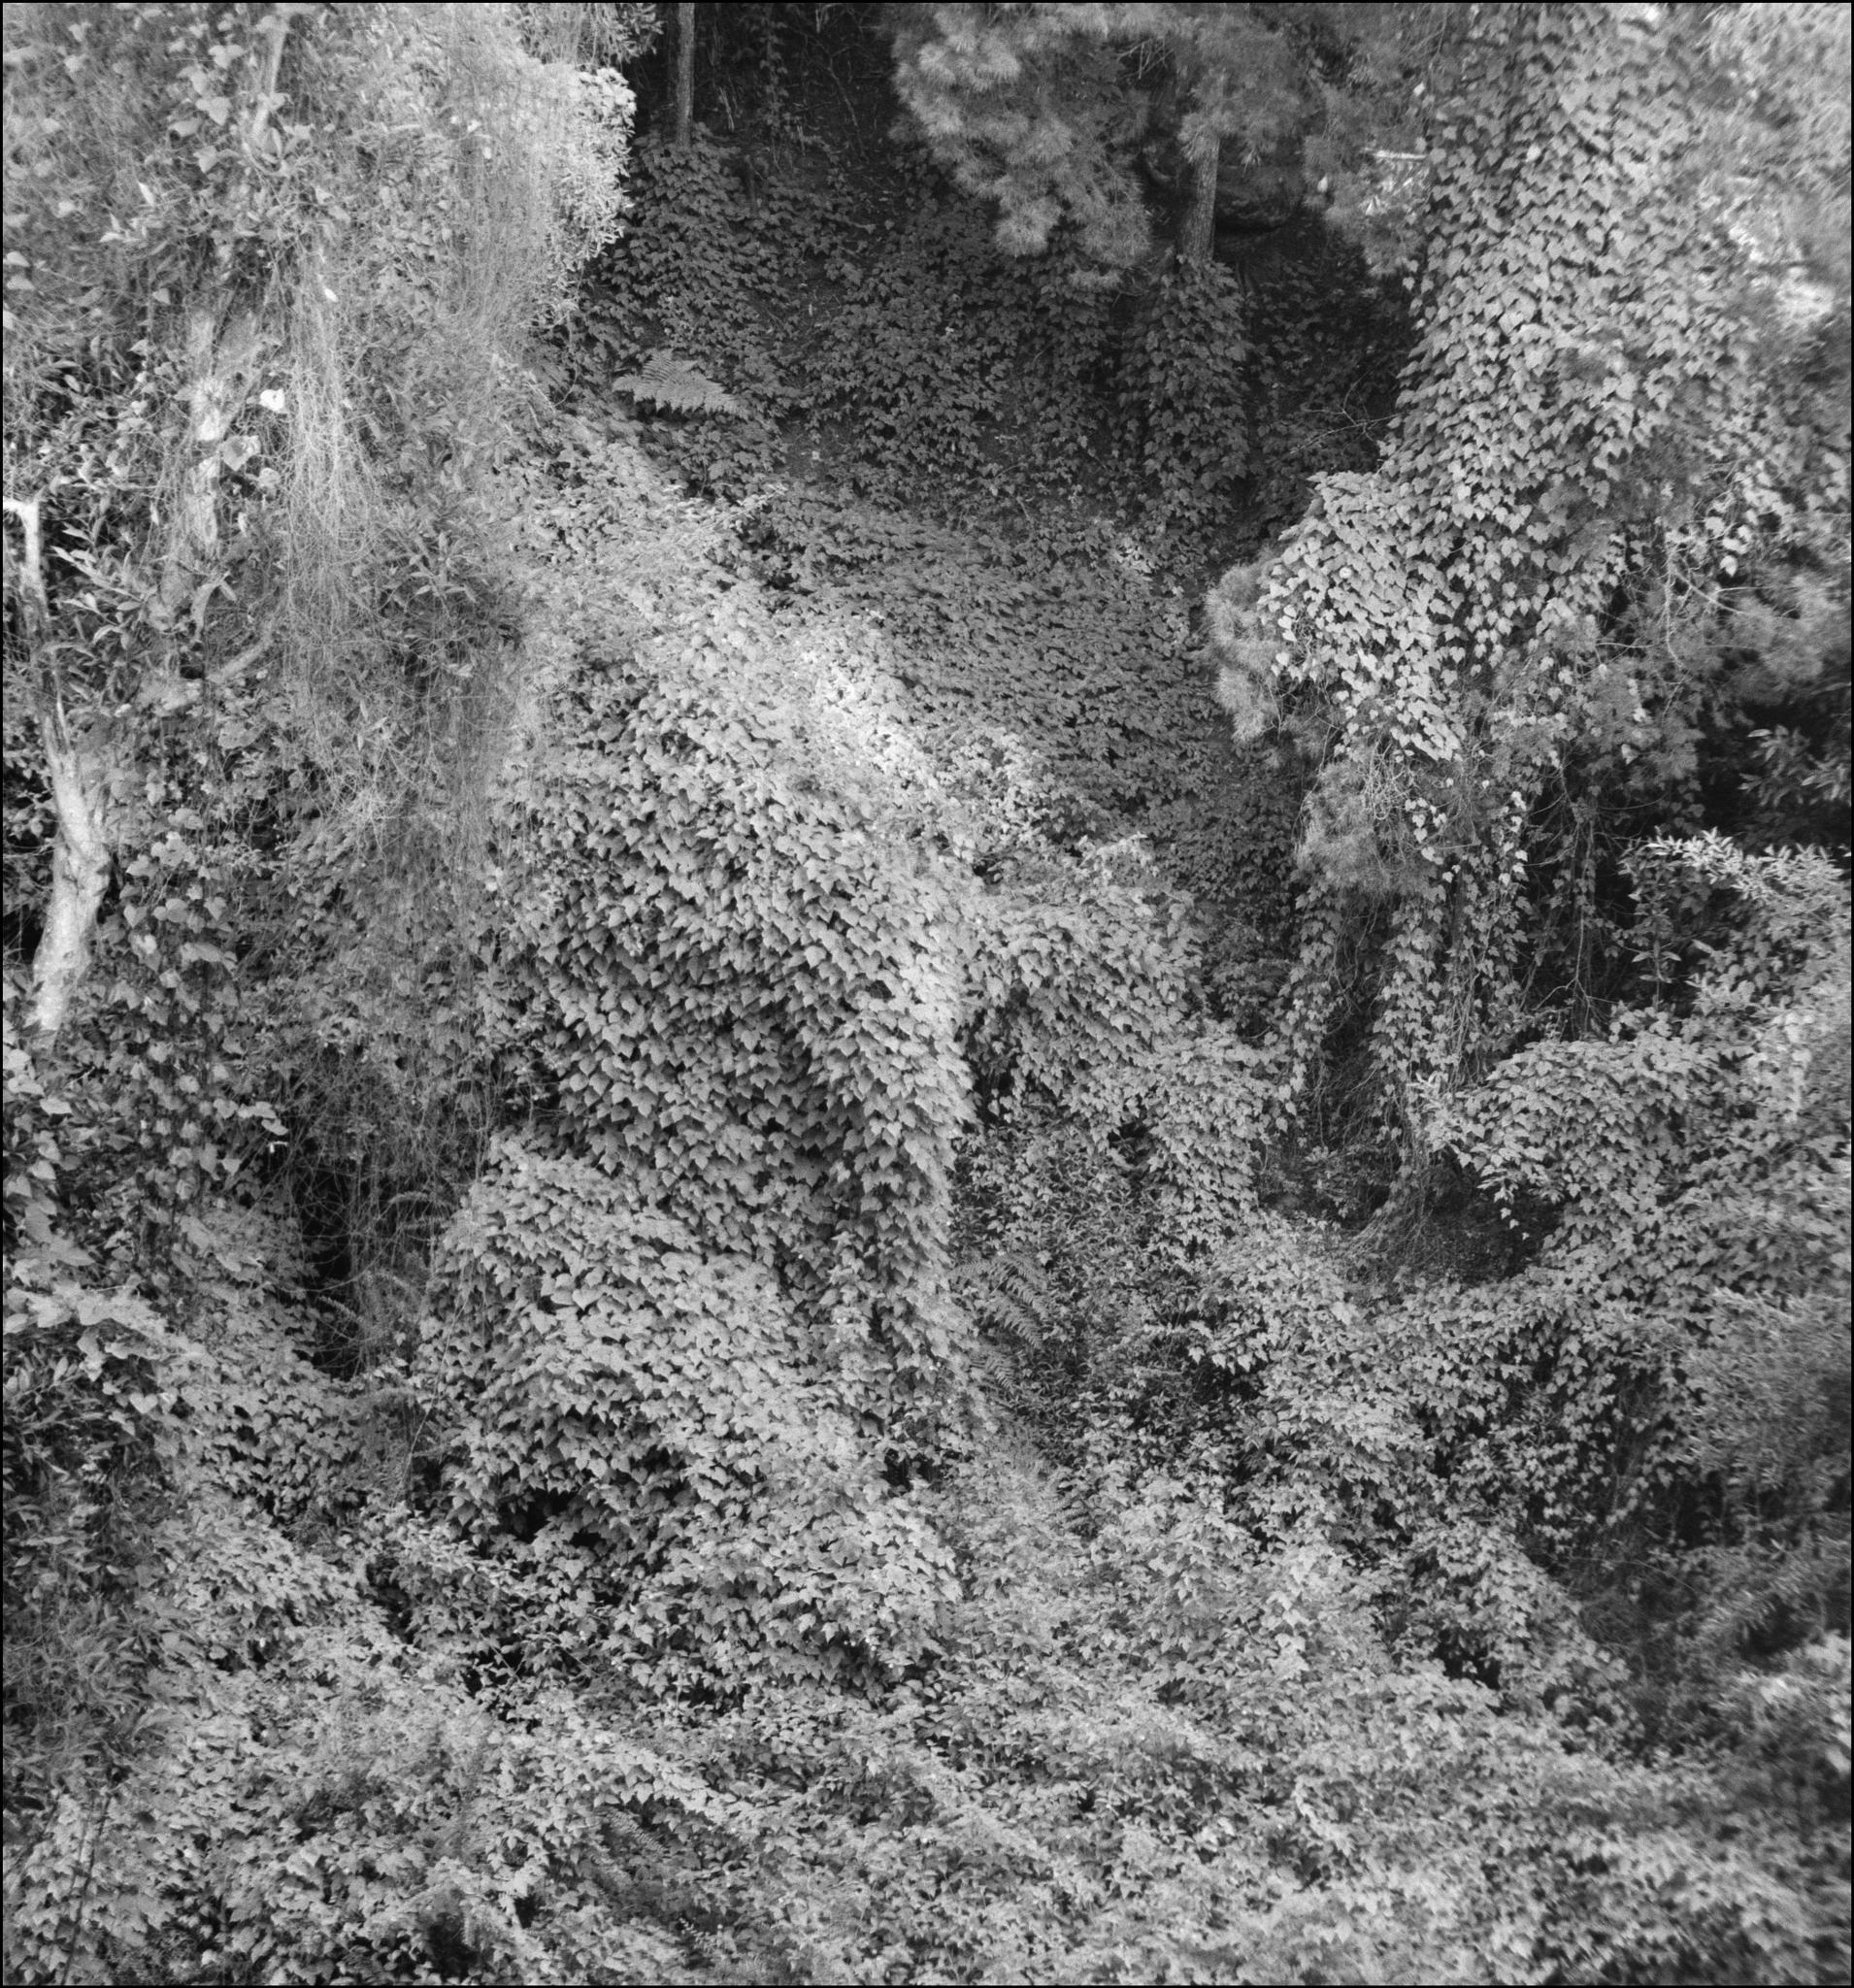 A Cascade of Foliage by Ozroo